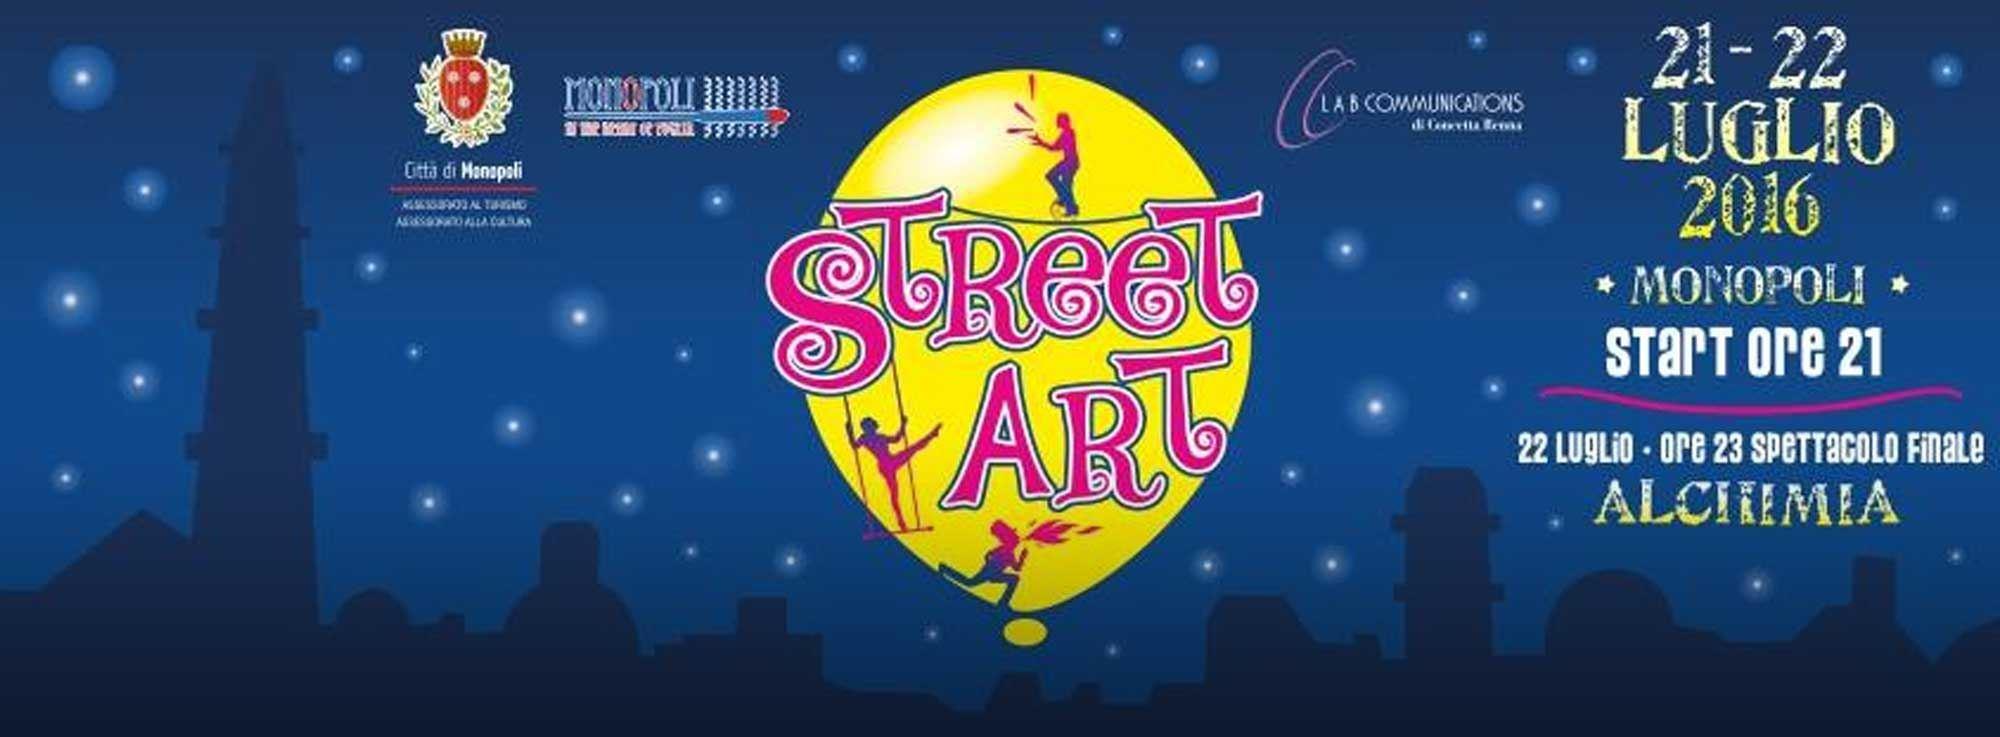 Monopoli: Street ART - Artisti di Strada